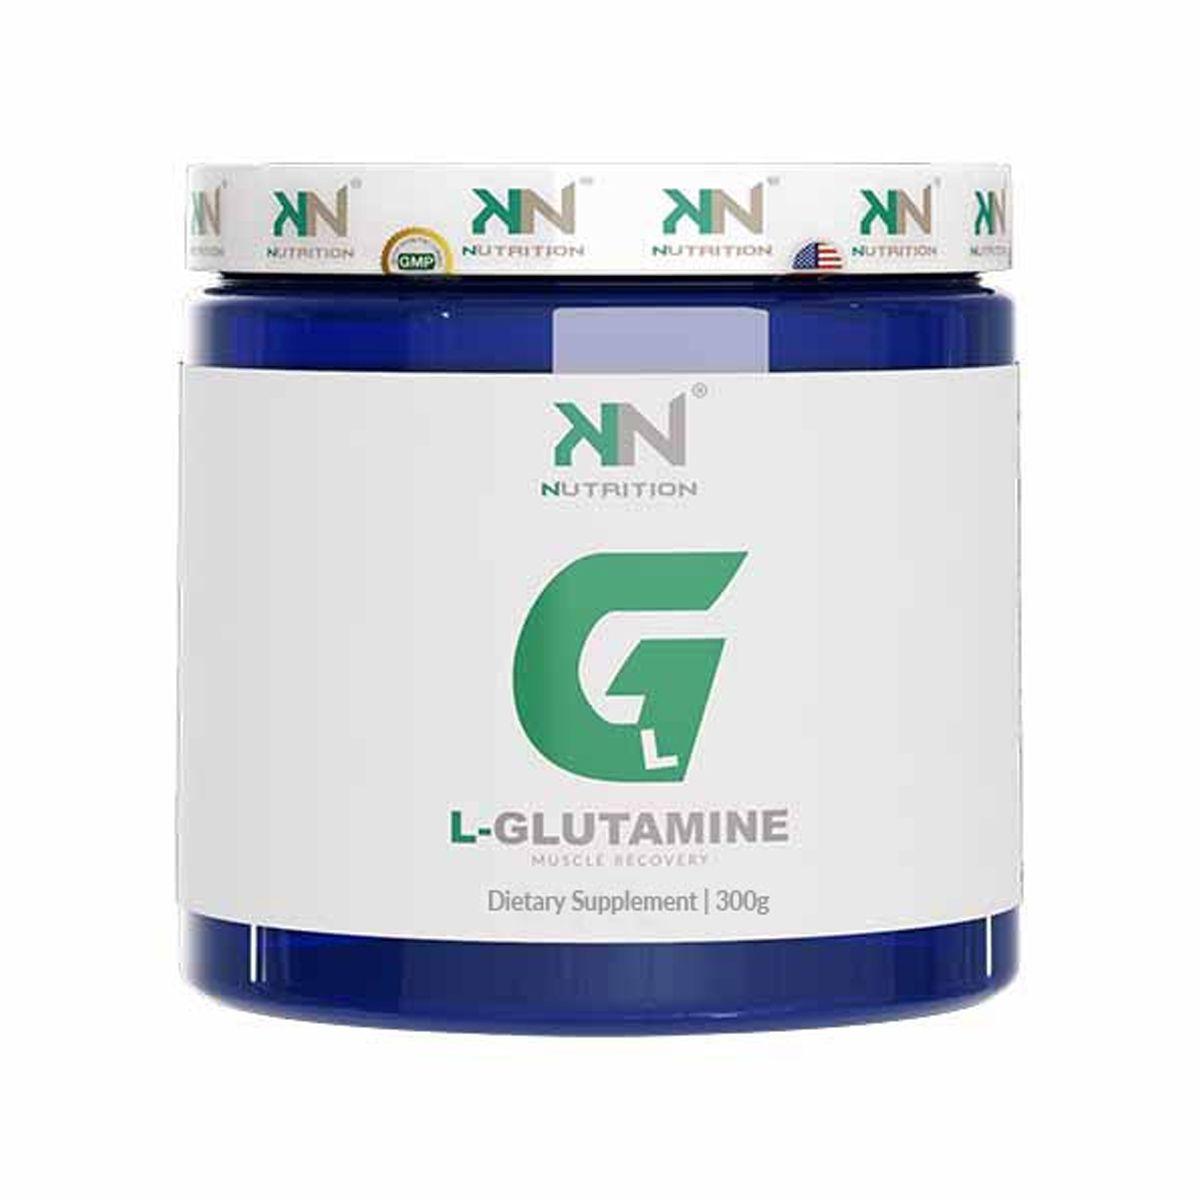 L-Glutamine - 300g - KN Nutrition